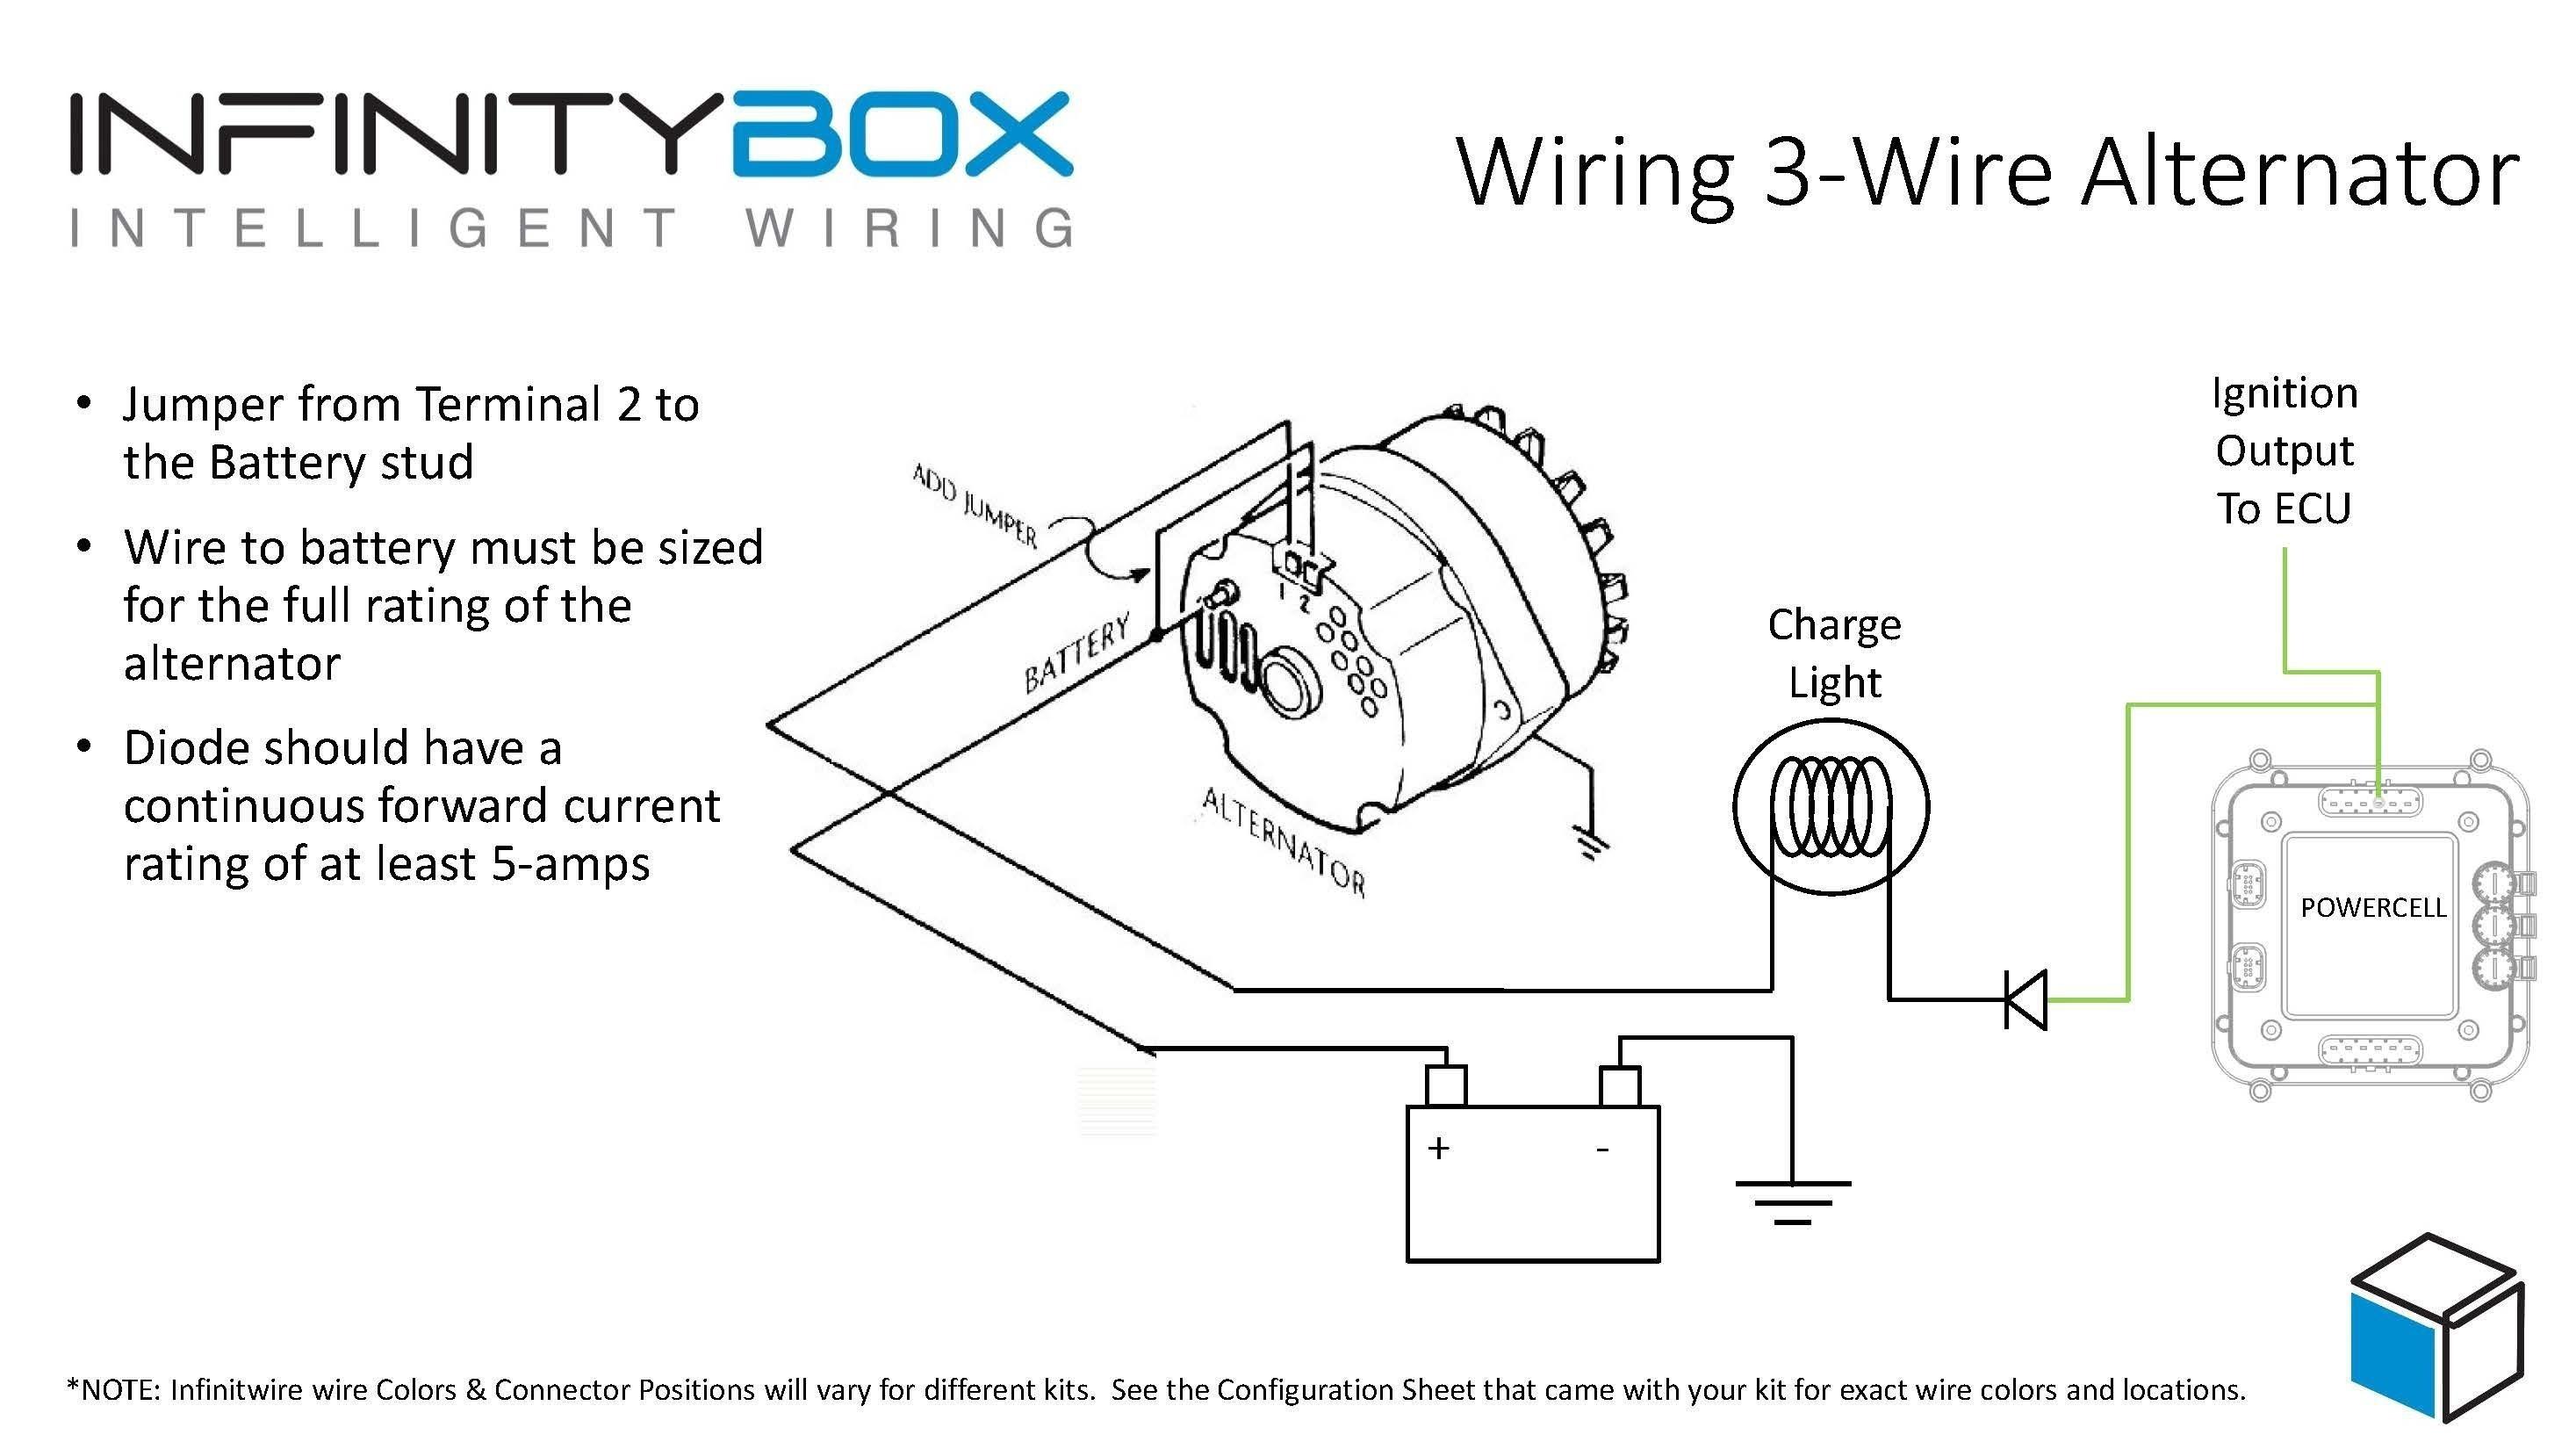 Wiring Diagram e Wire Alternator New Gm Alternator Wiring Diagram  Inspirational 2 Wire Alternator Wiring